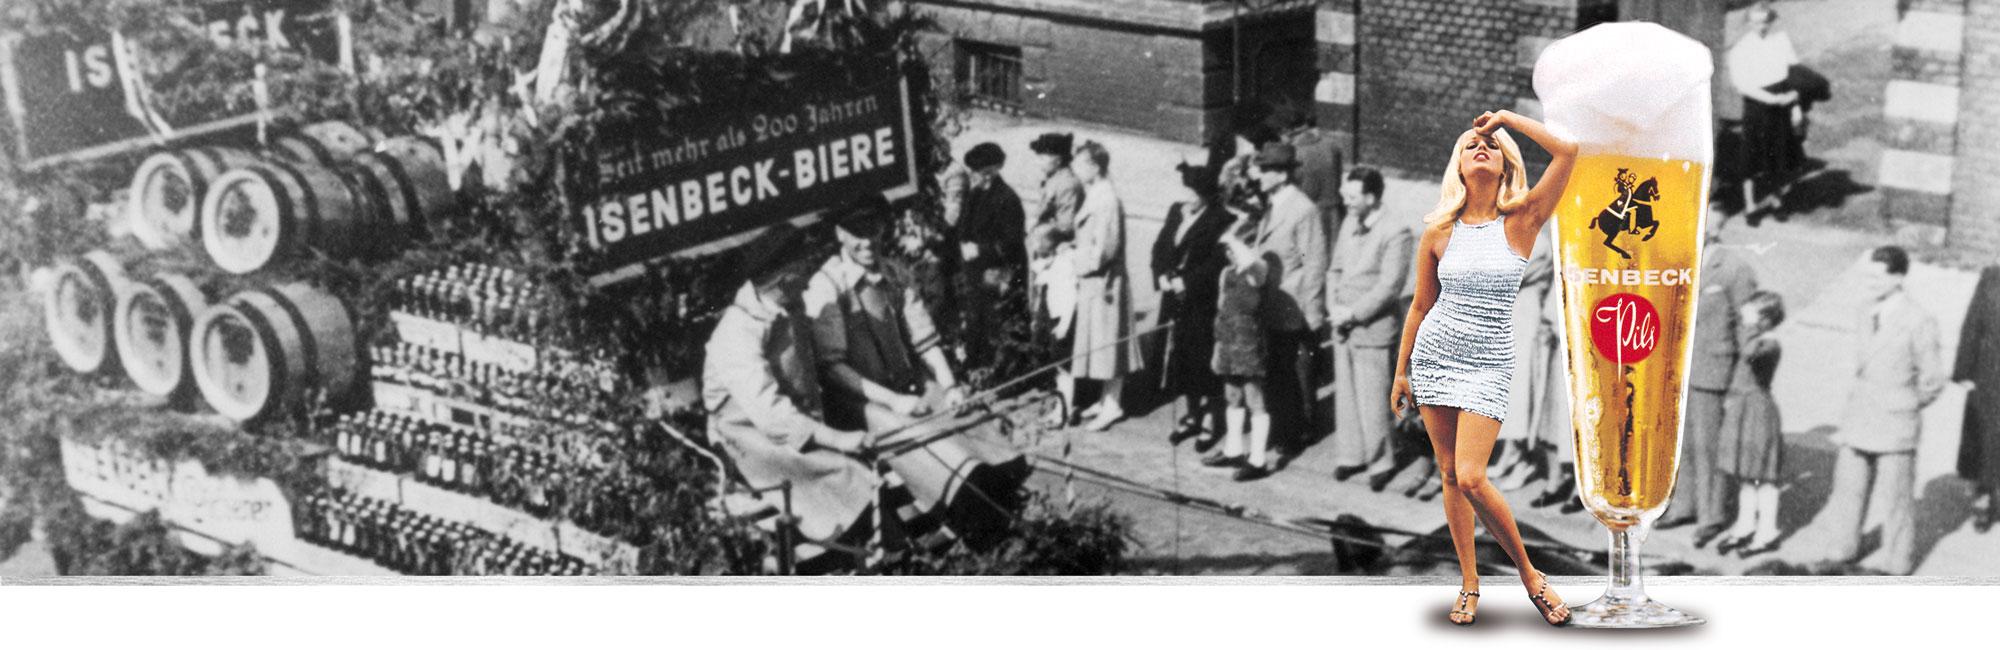 Isenbeck Historie